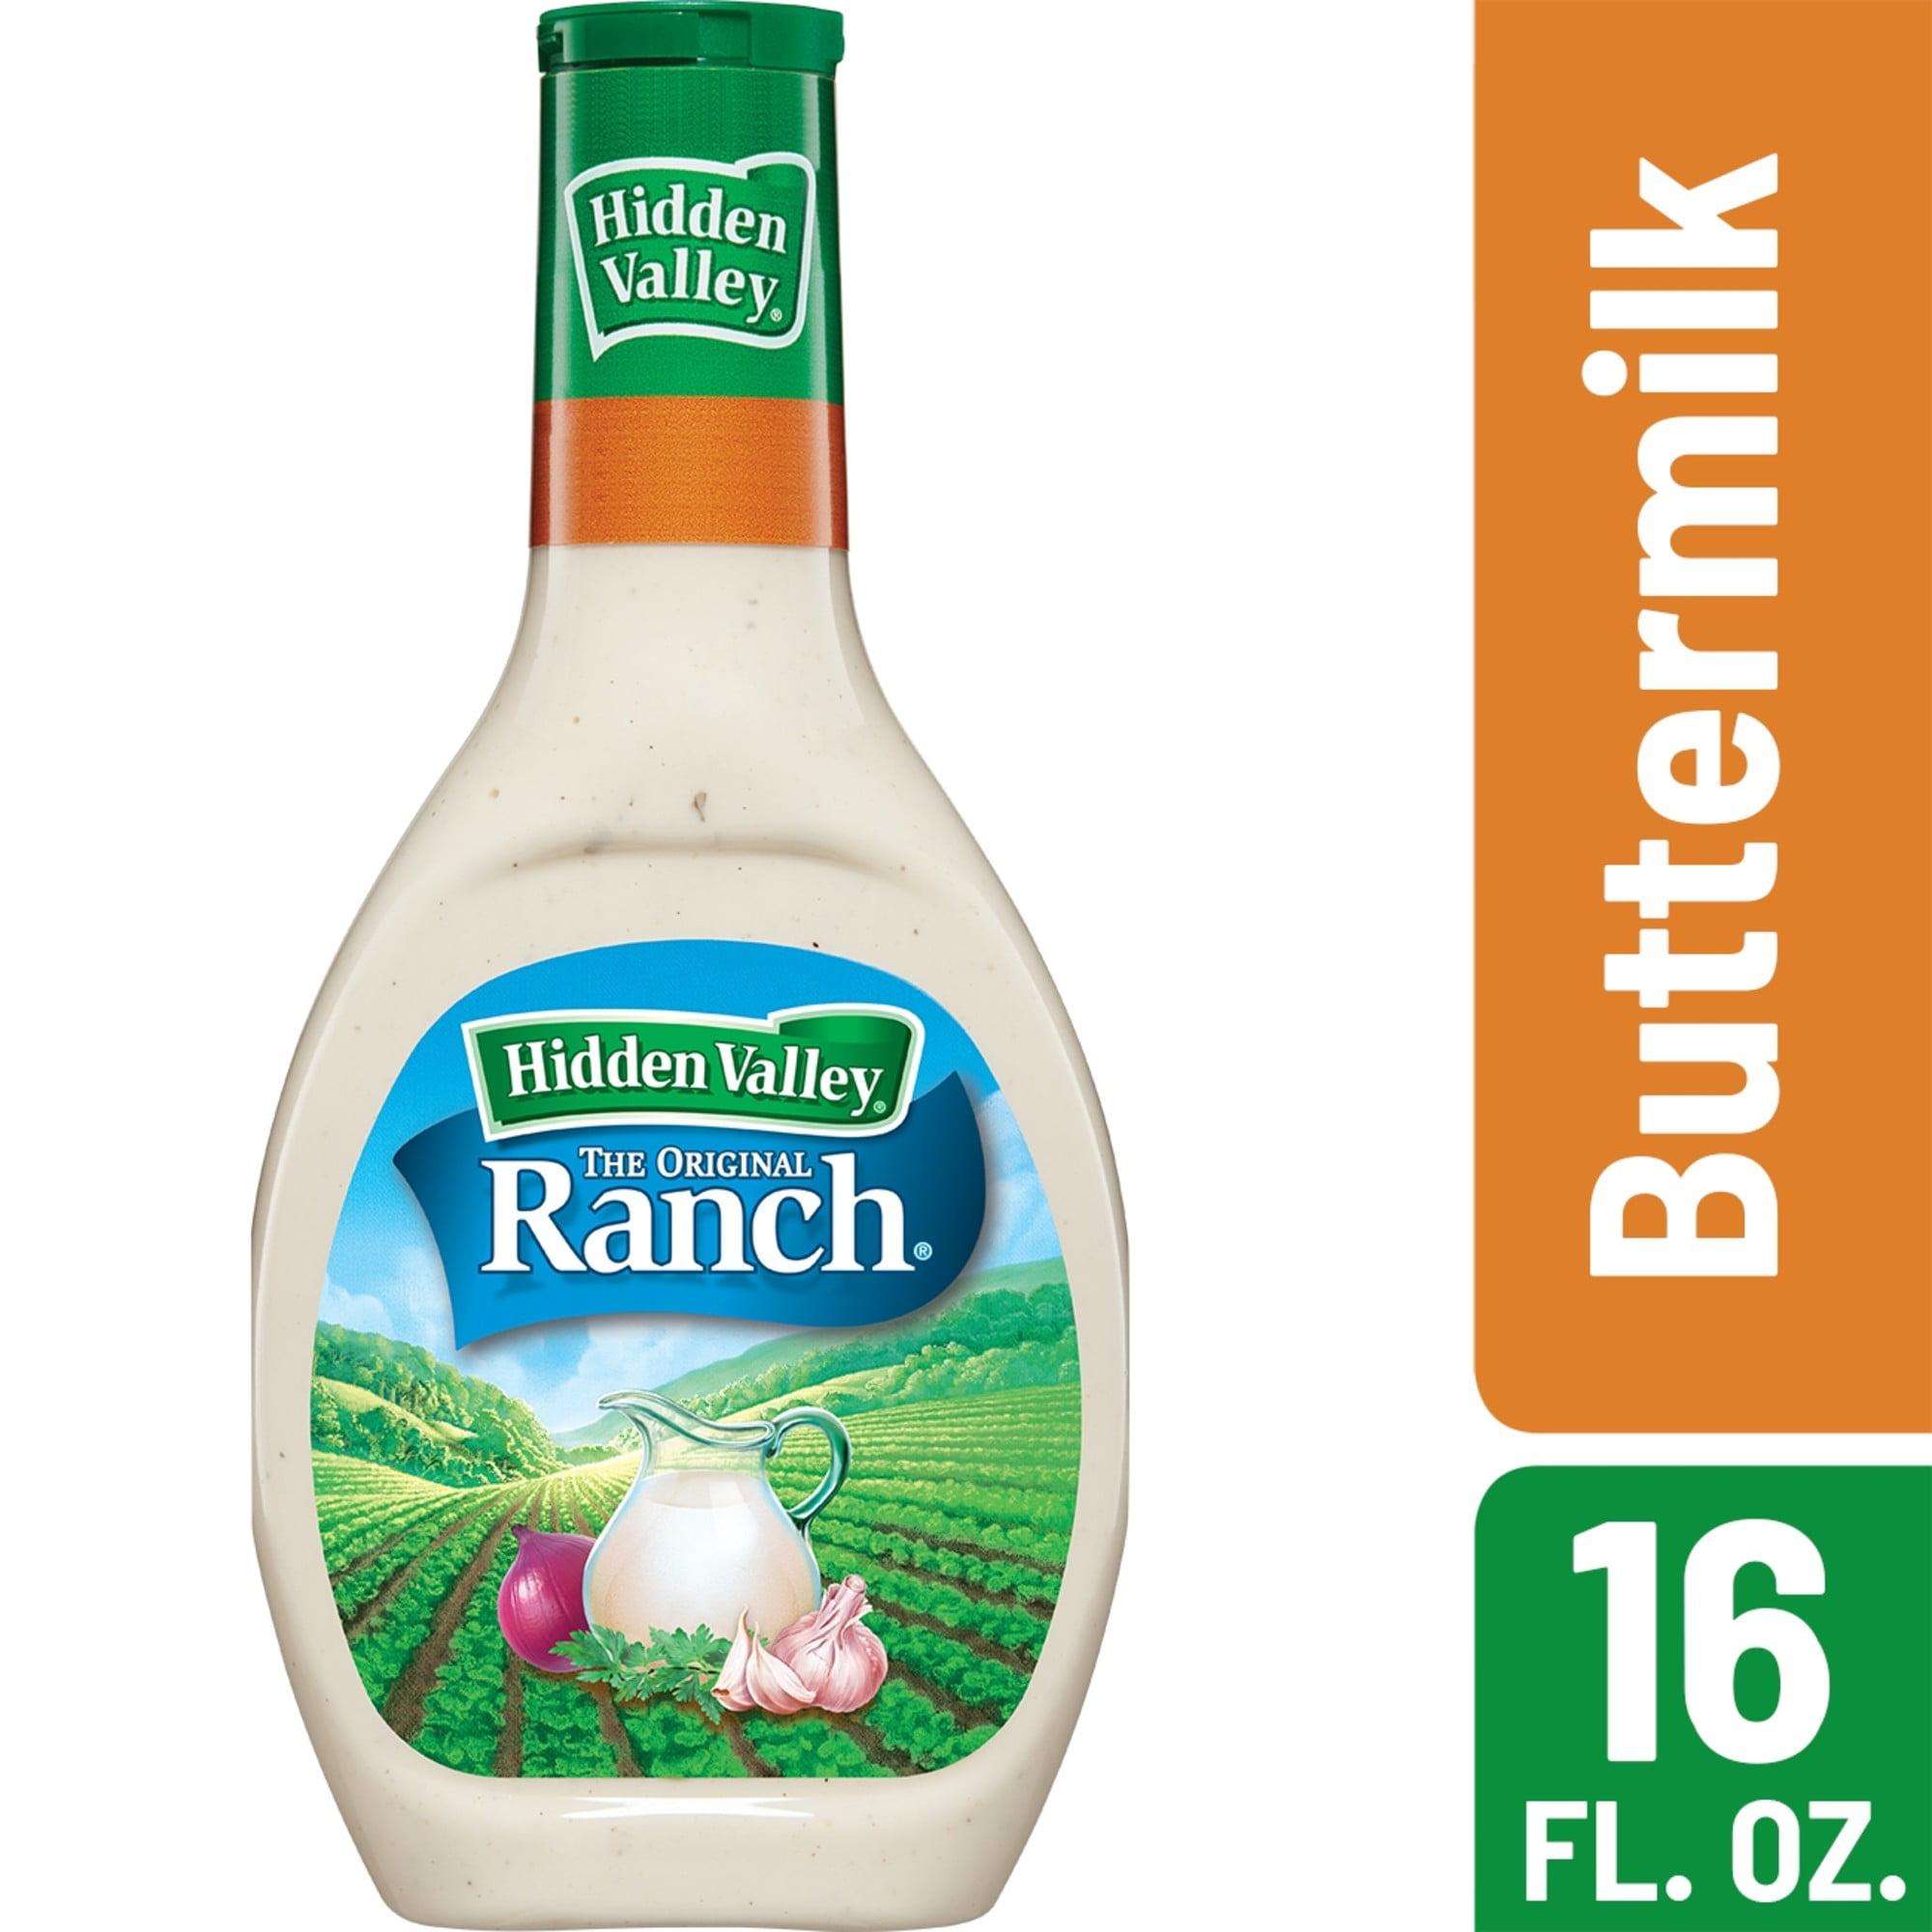 Hidden Valley Buttermilk Ranch Salad Dressing & Topping - 16fl oz